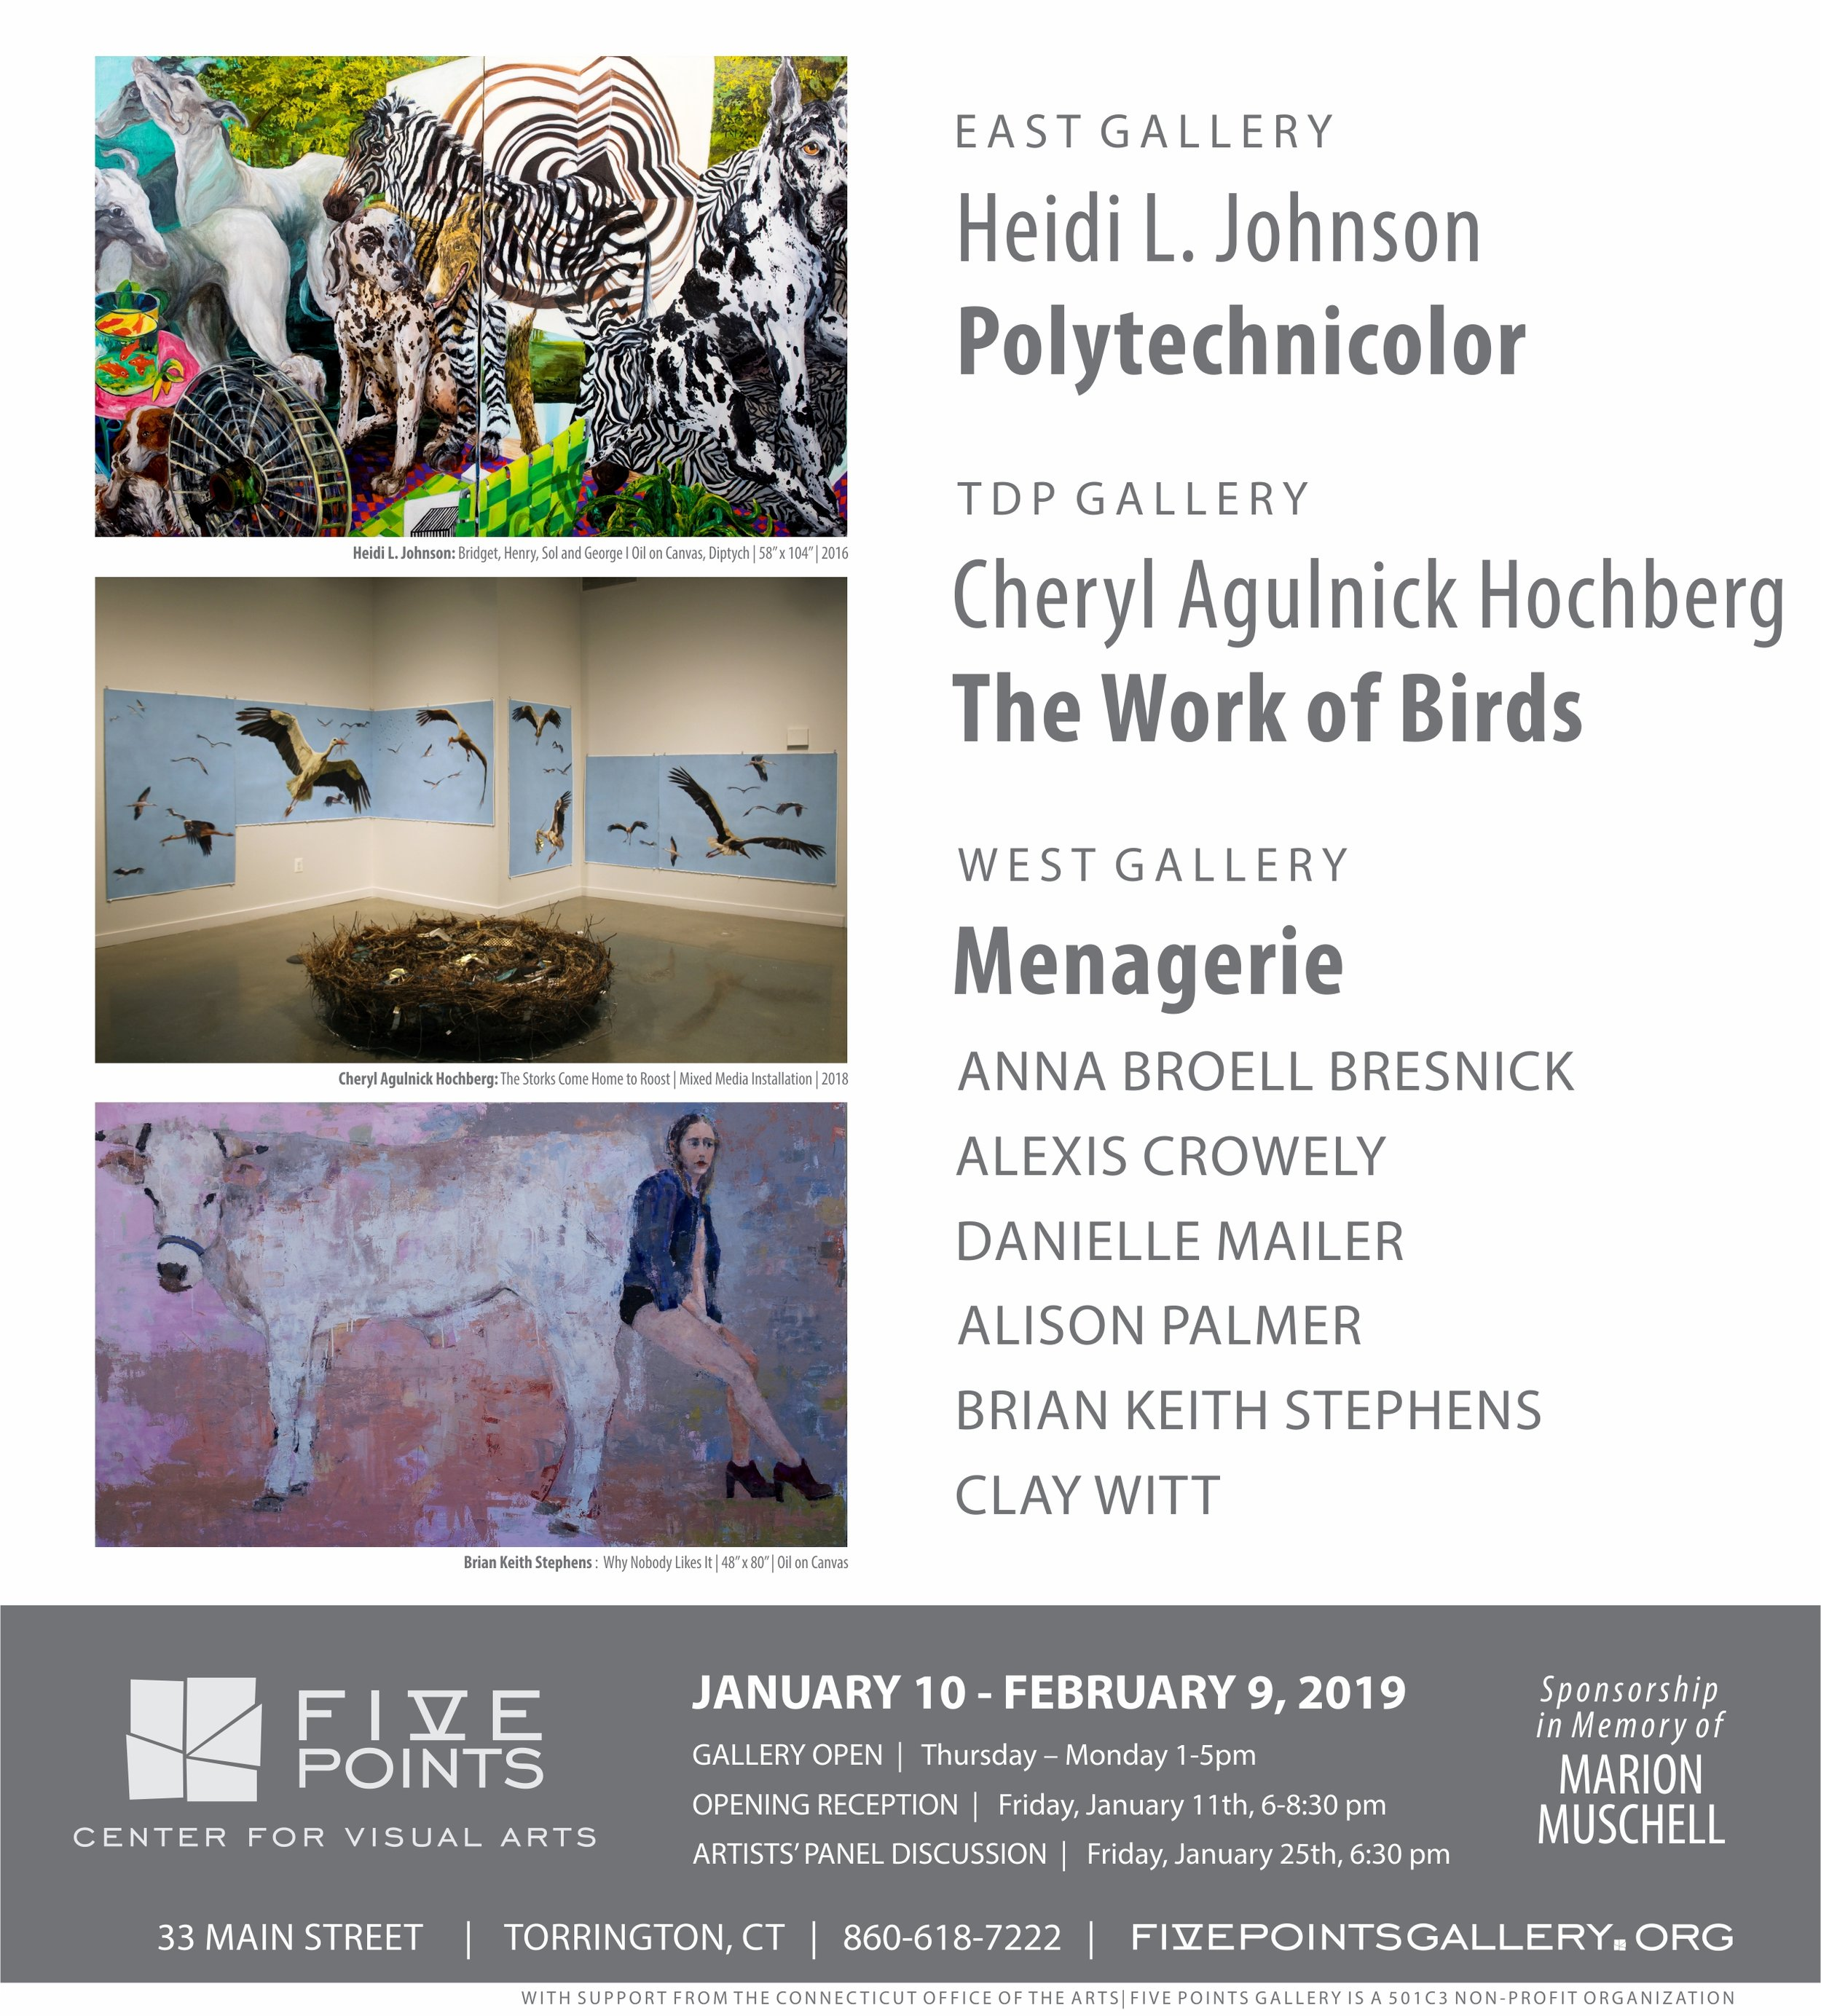 The Work of Birds